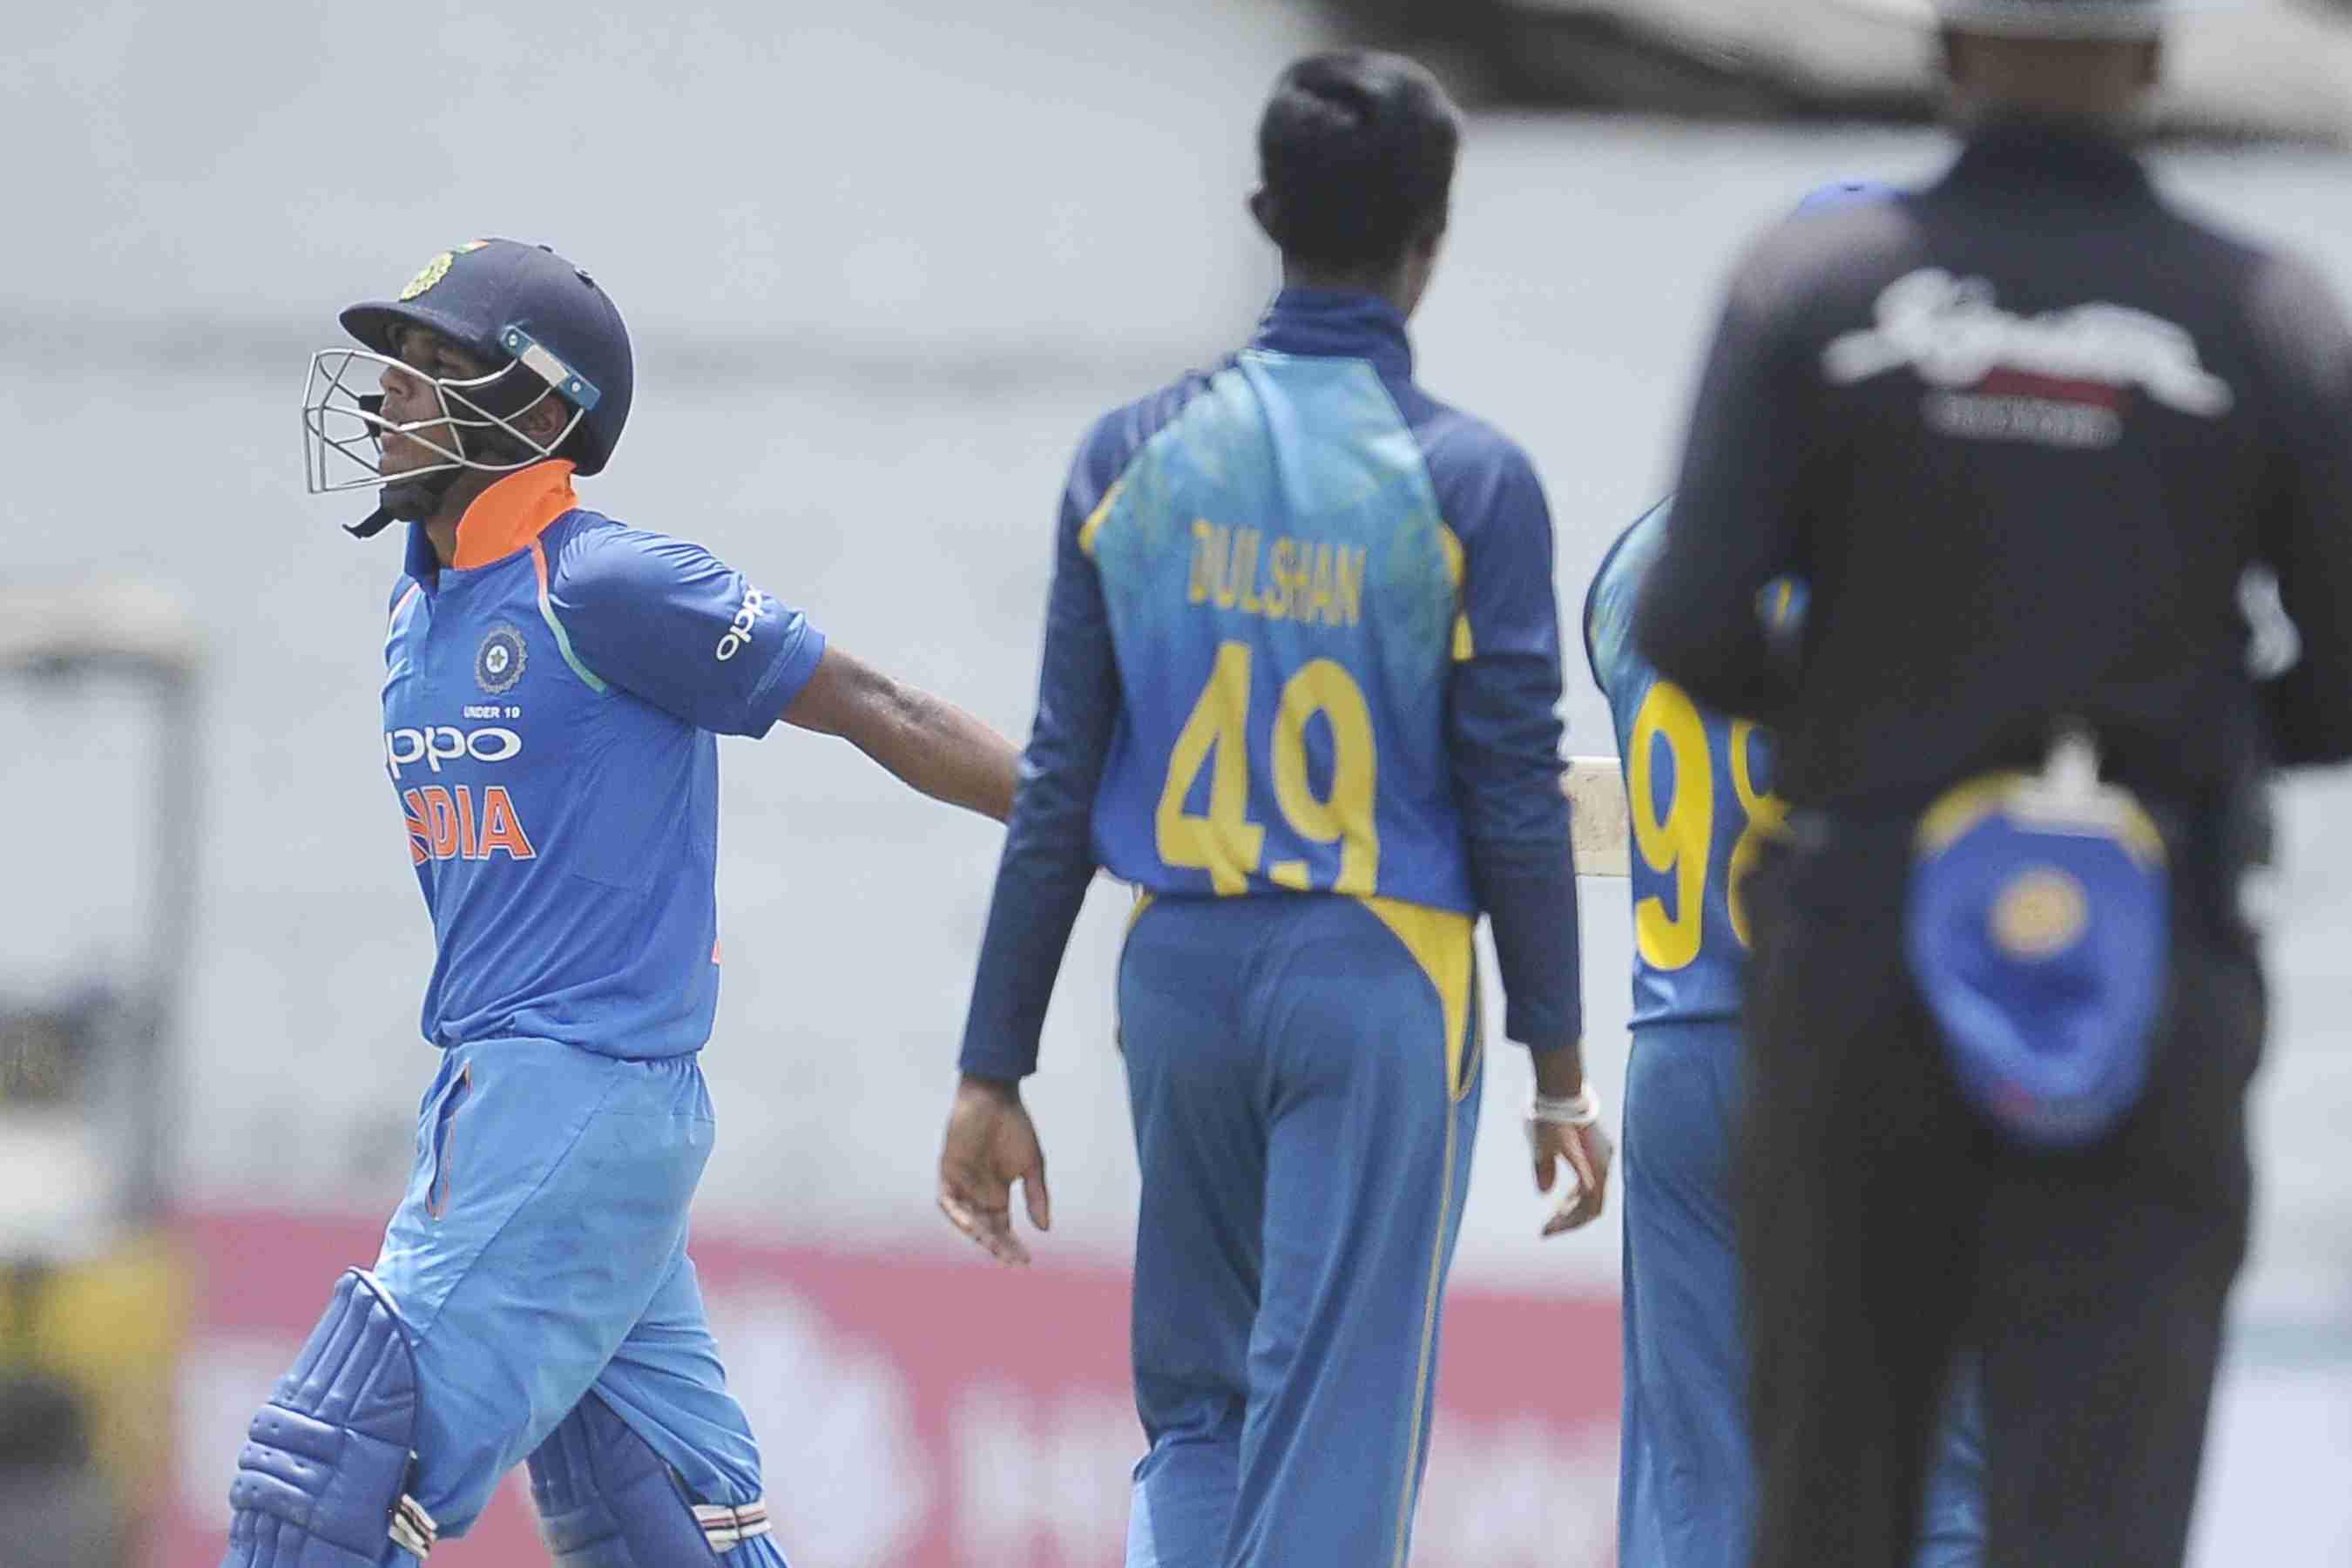 India Under 19 Beat Sri Lanka Under 19 By 135 Runs To